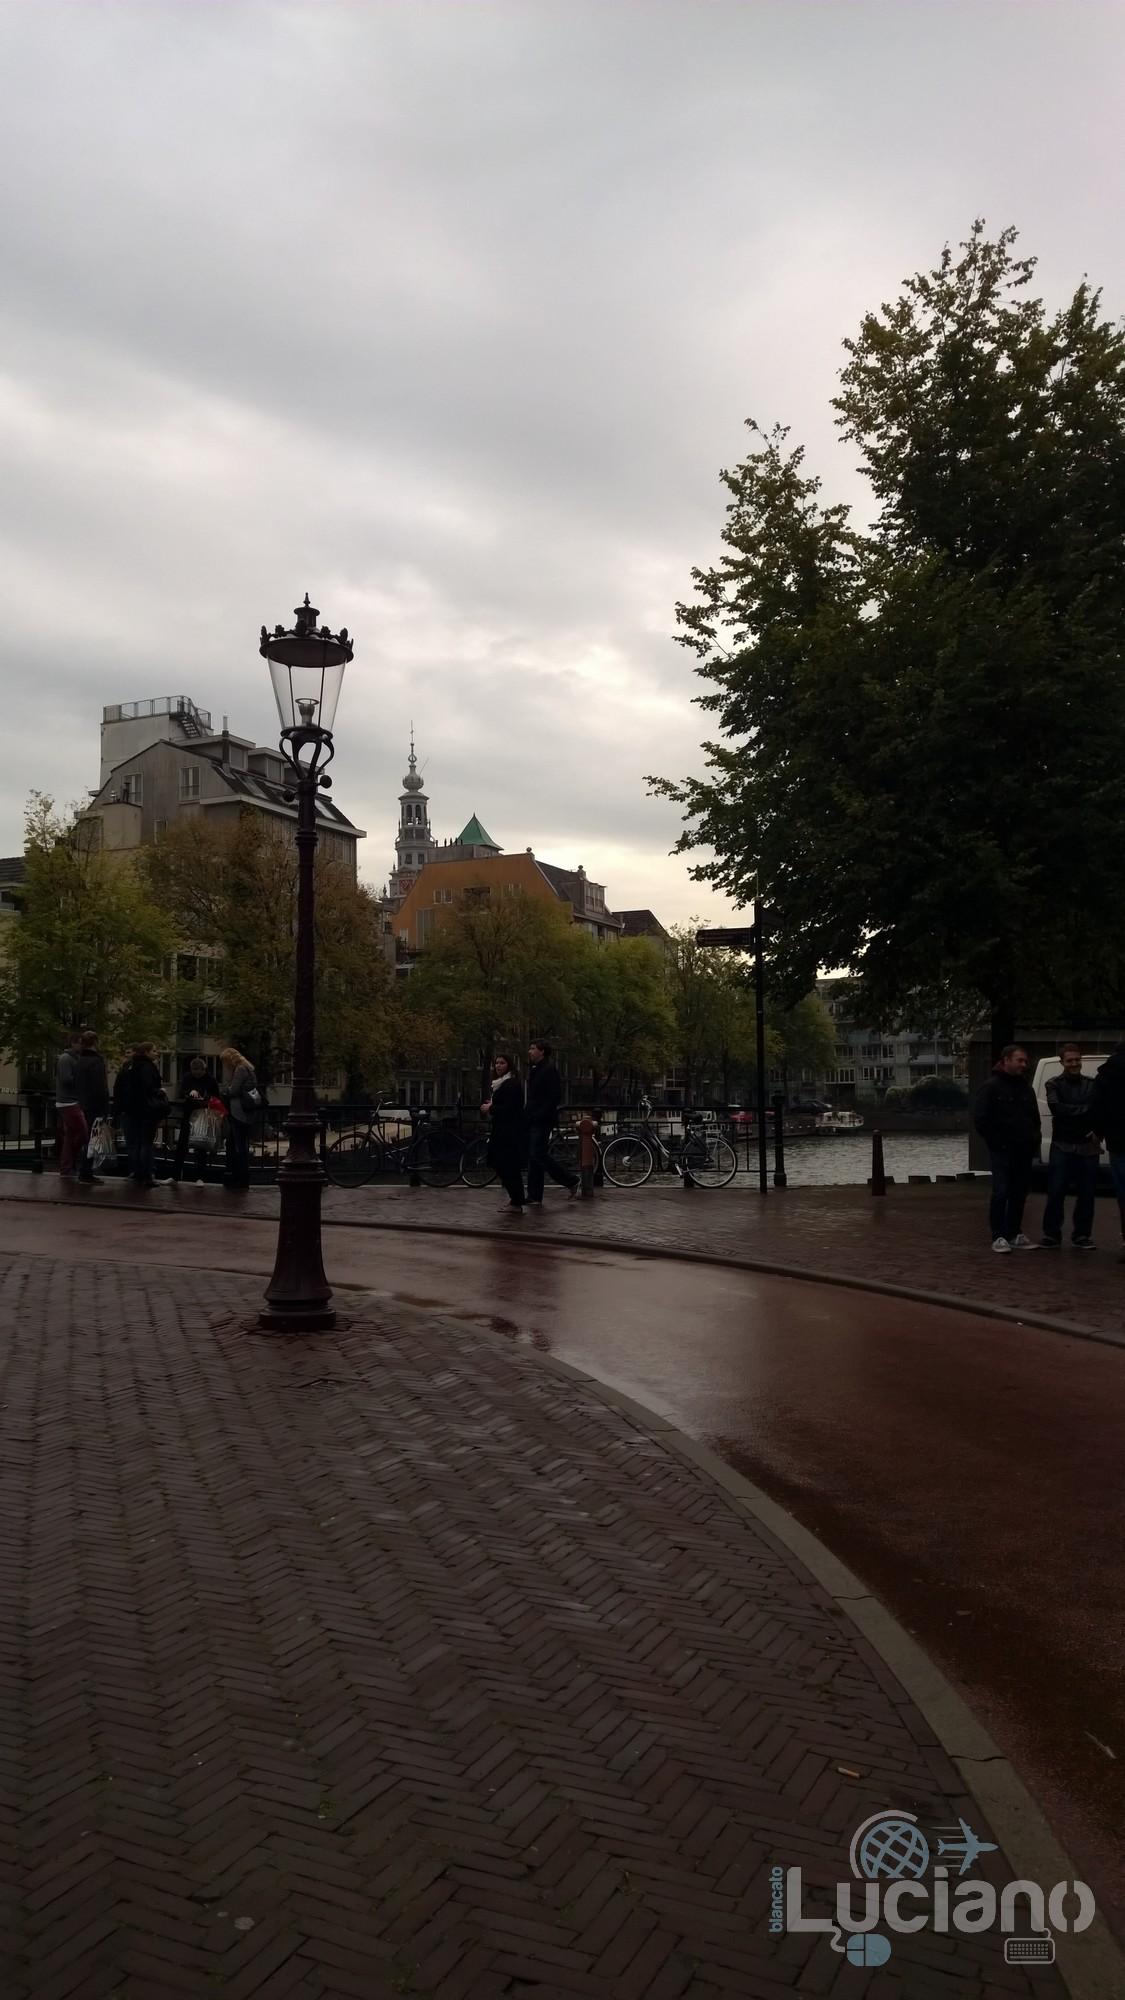 amsterdam-2014-vueling-lucianoblancatoit (178)